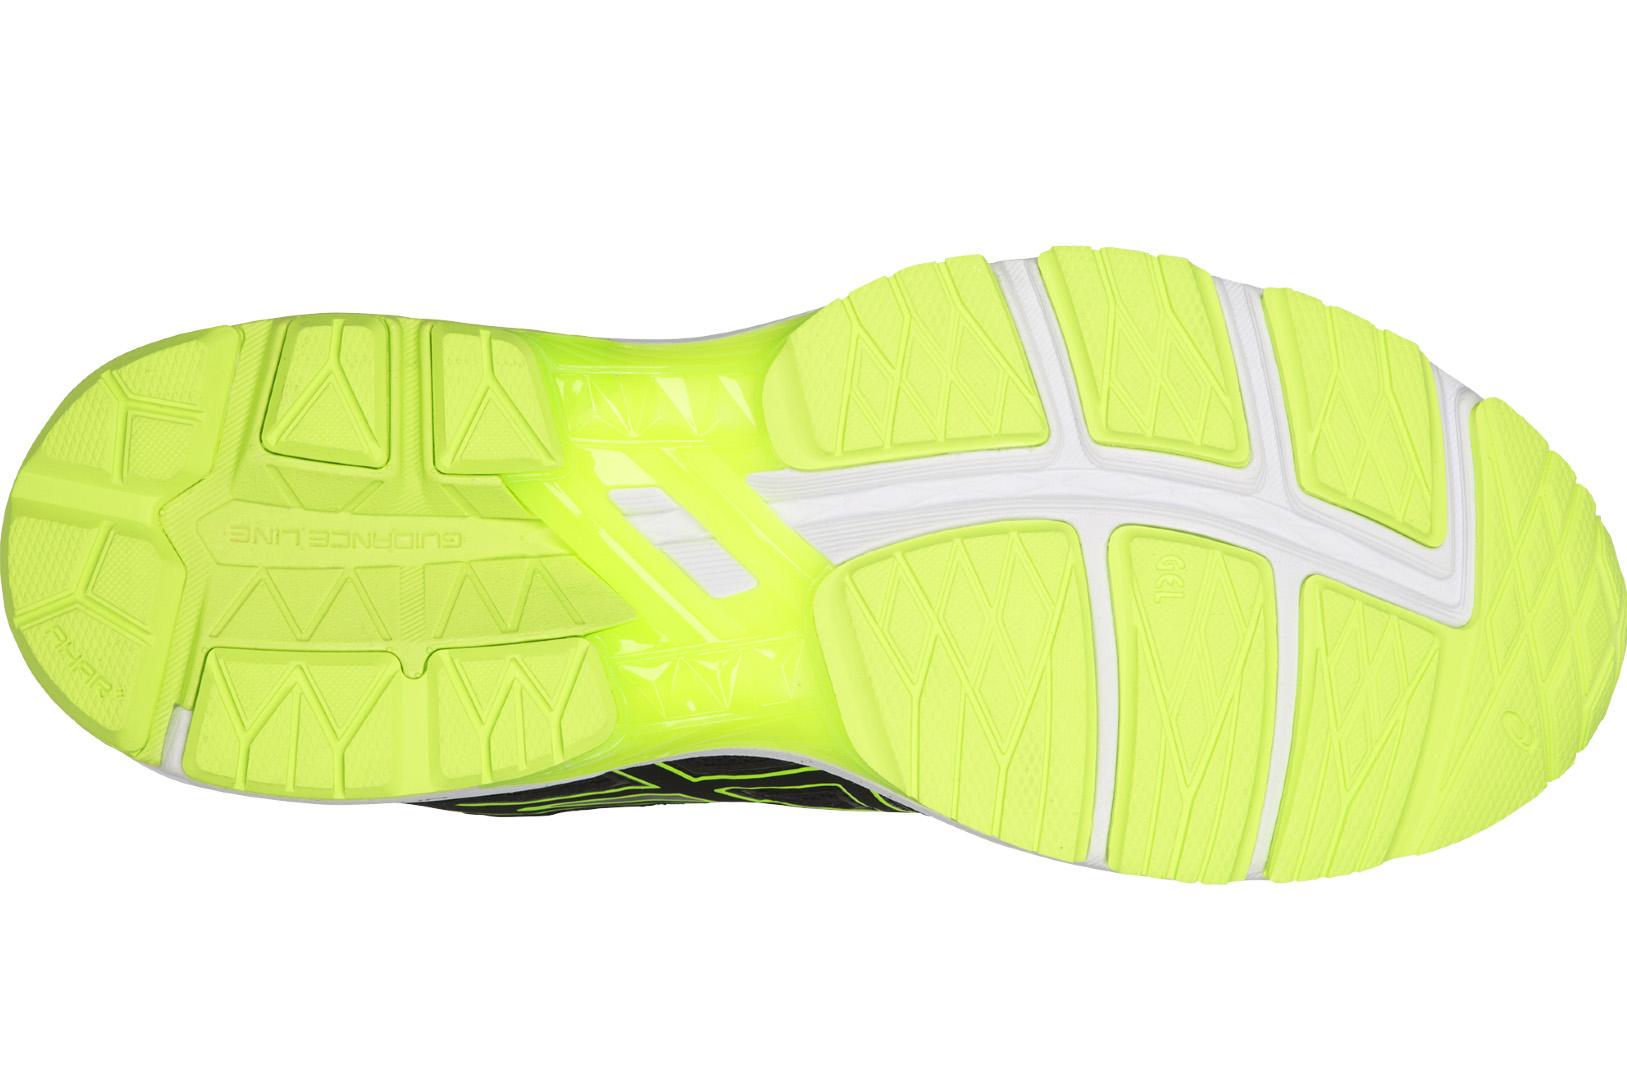 Bežecká obuv Asics GT-1000 6 - T7A4N-9007  f3f93d11131